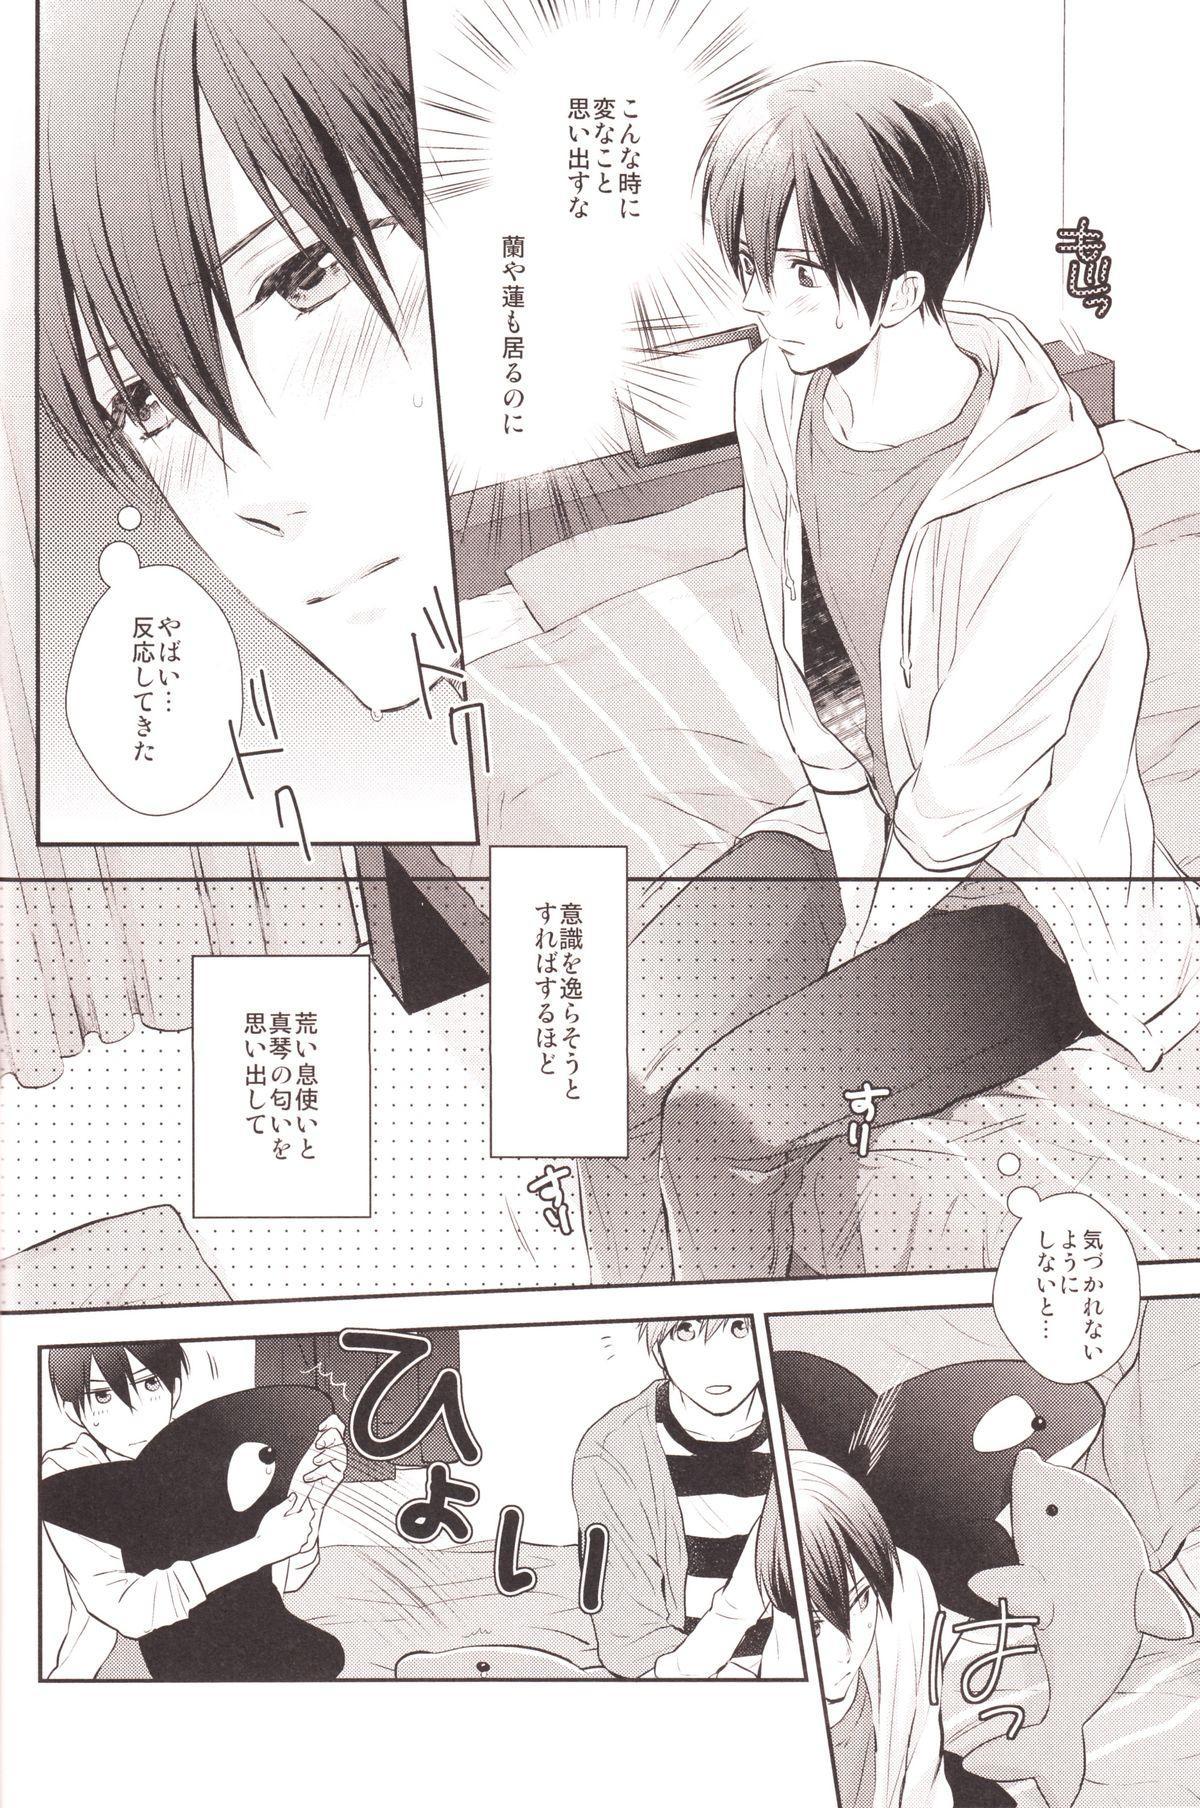 Haru-chan no Wanko 12